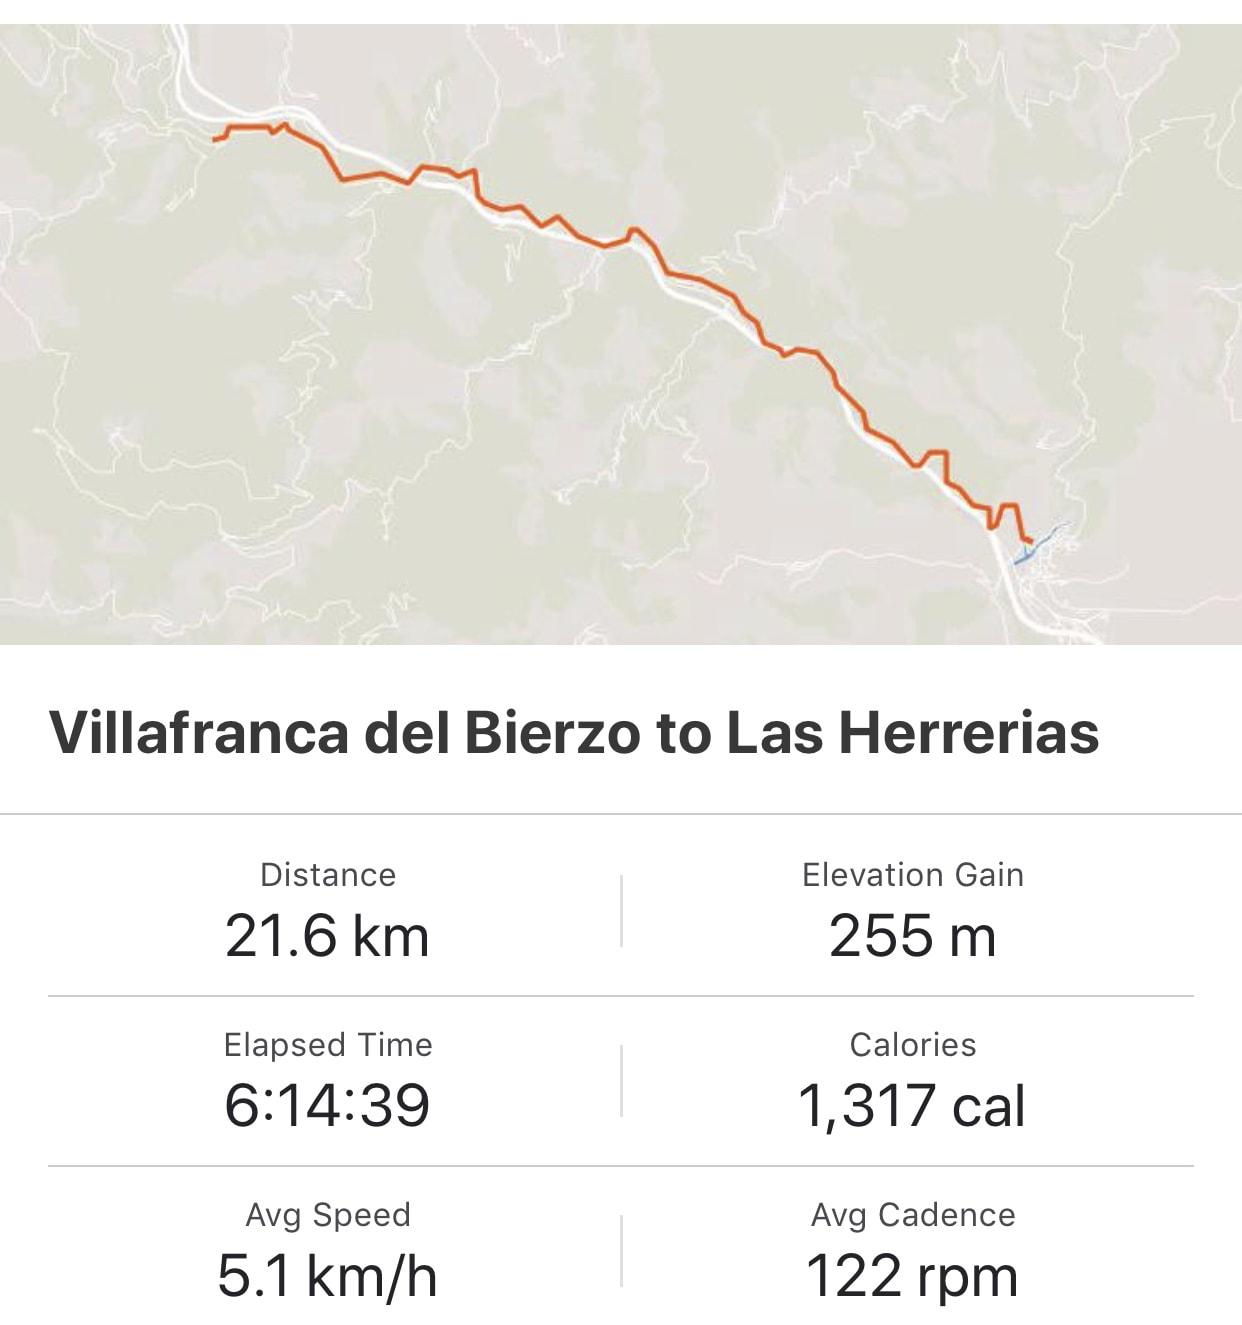 Strava: Villafranca del Bierzo to Las Herrerias